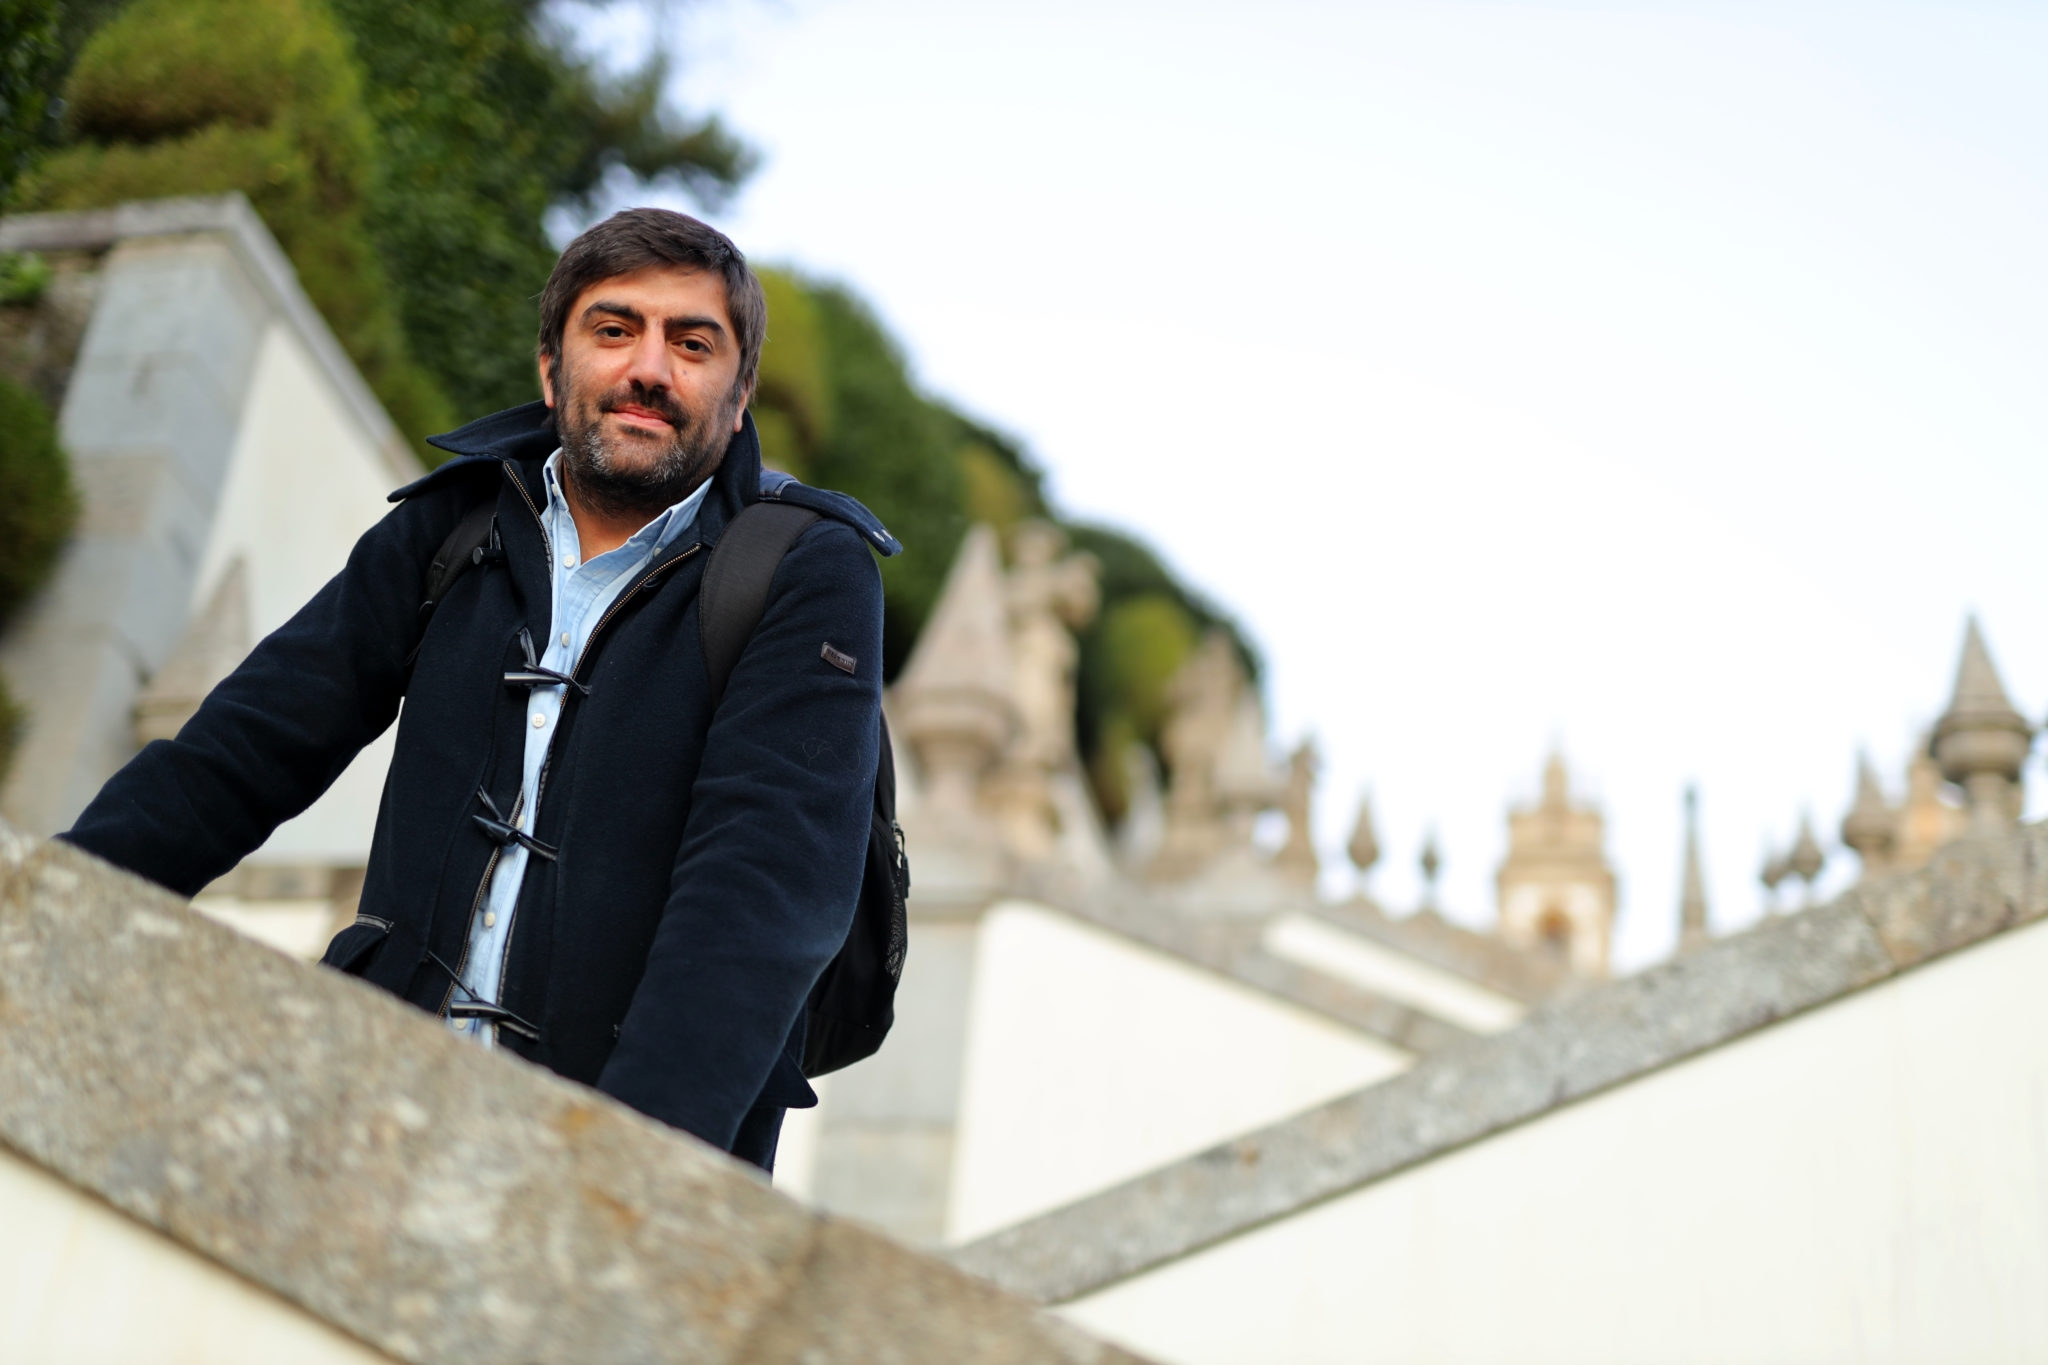 Marco Araújo O MINHO _ PDG5 Media